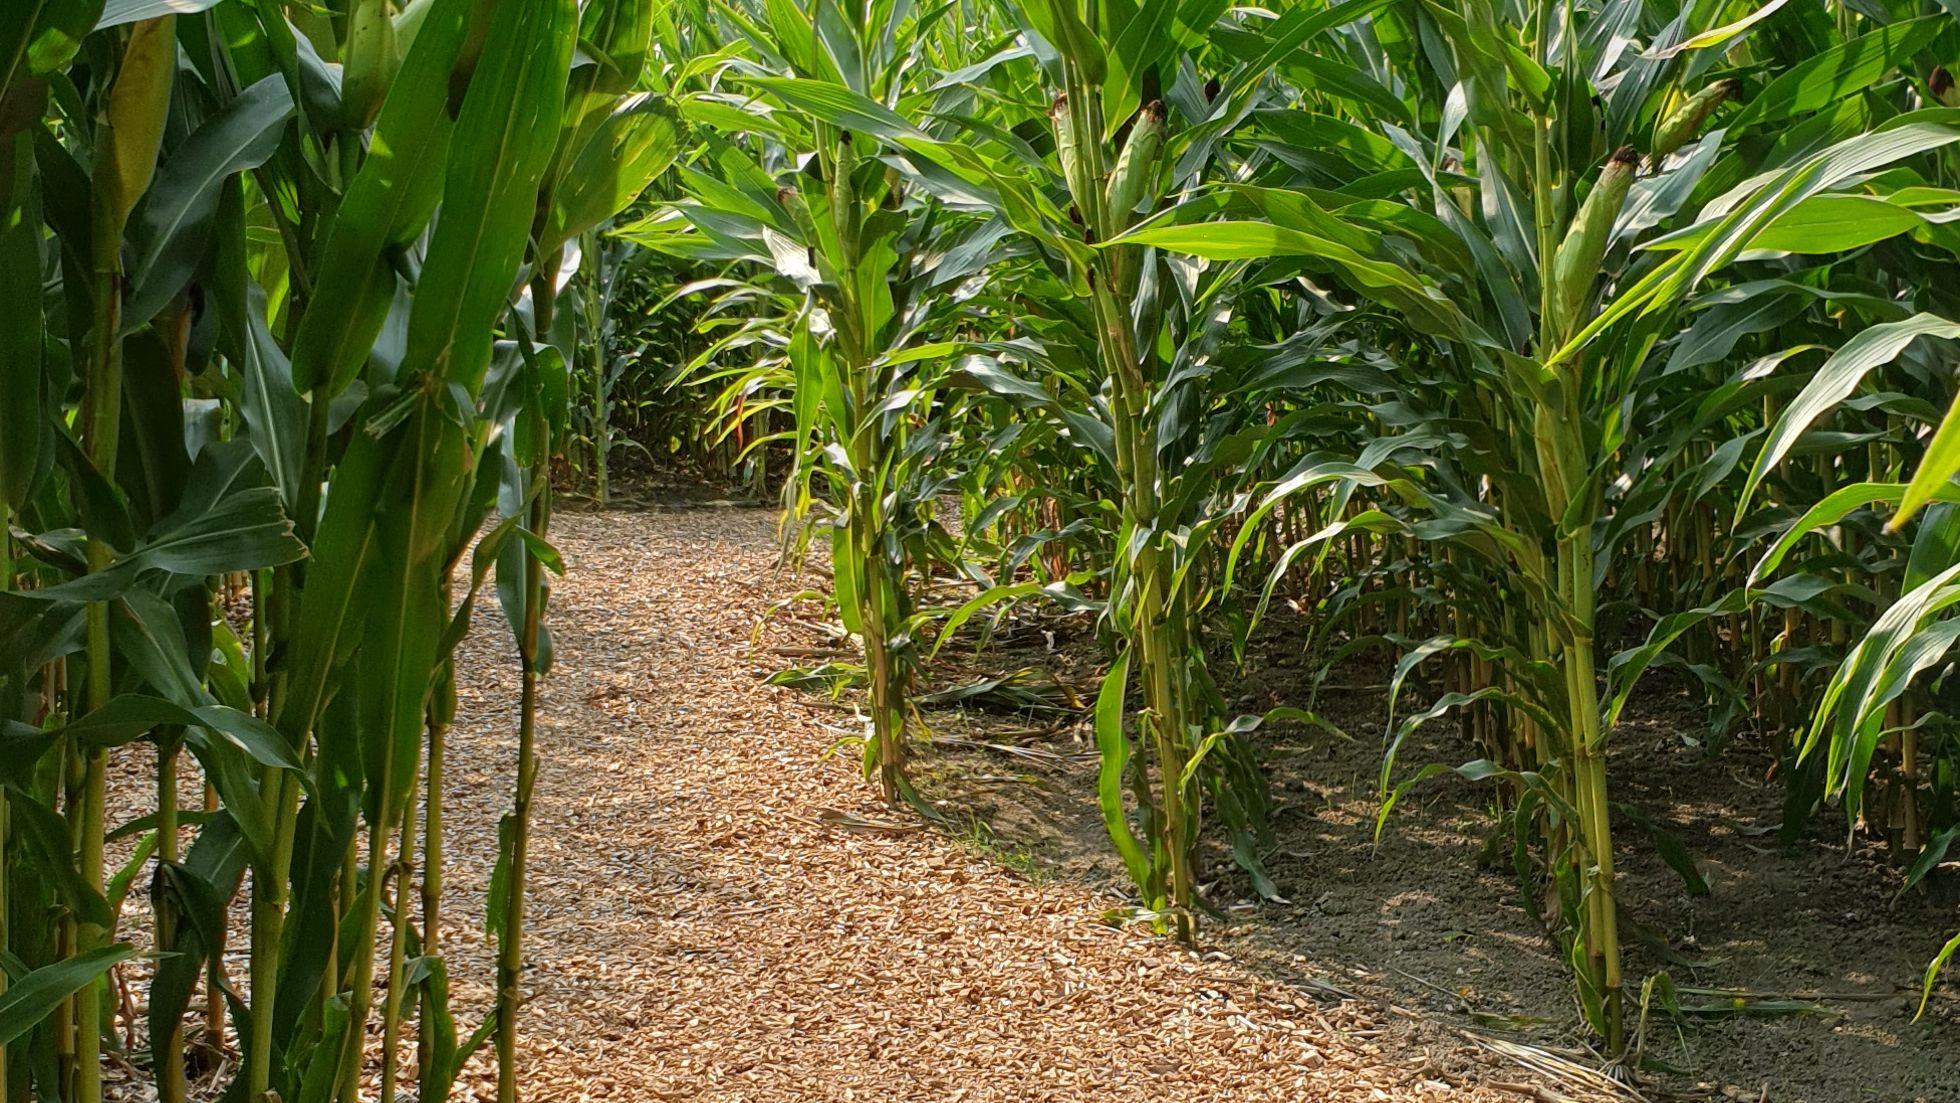 Cornys Maislabyrinth und Abenteuerpark mit Insektenreservoir | Foto A & A Parkdesign GbR